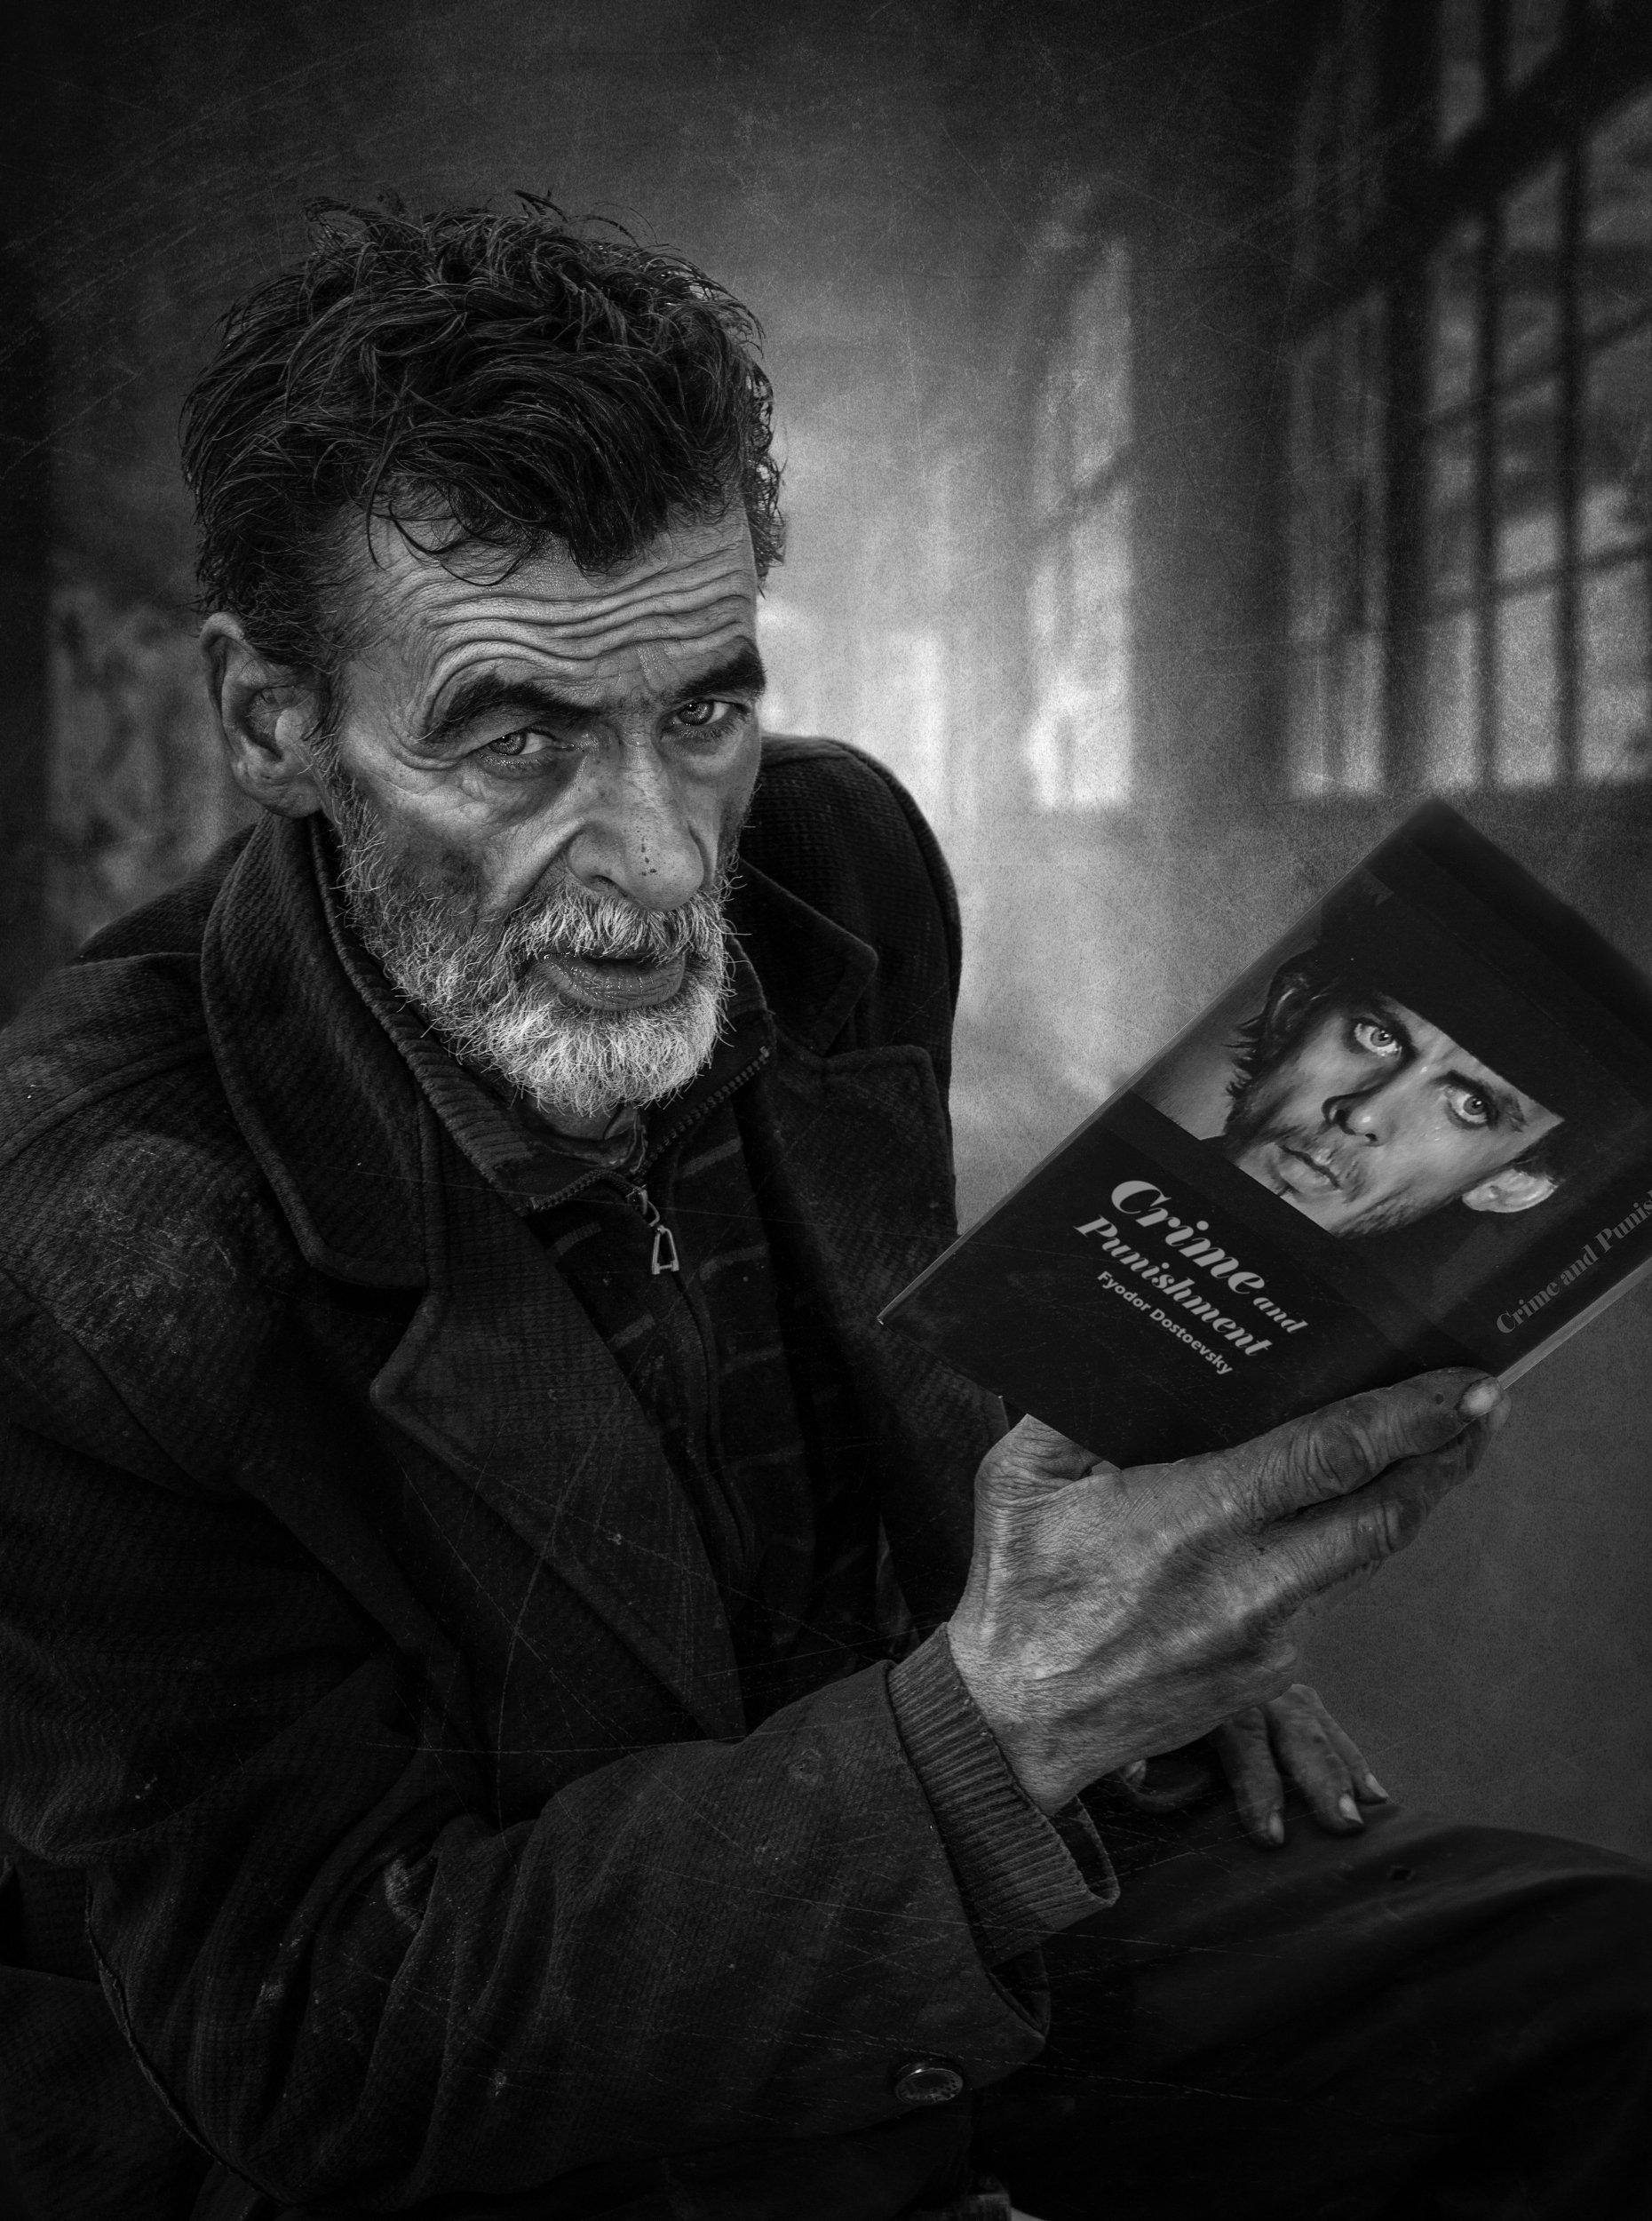 #people #portrait #face #skin #look #eye #human #book, Zavvar Mehdi